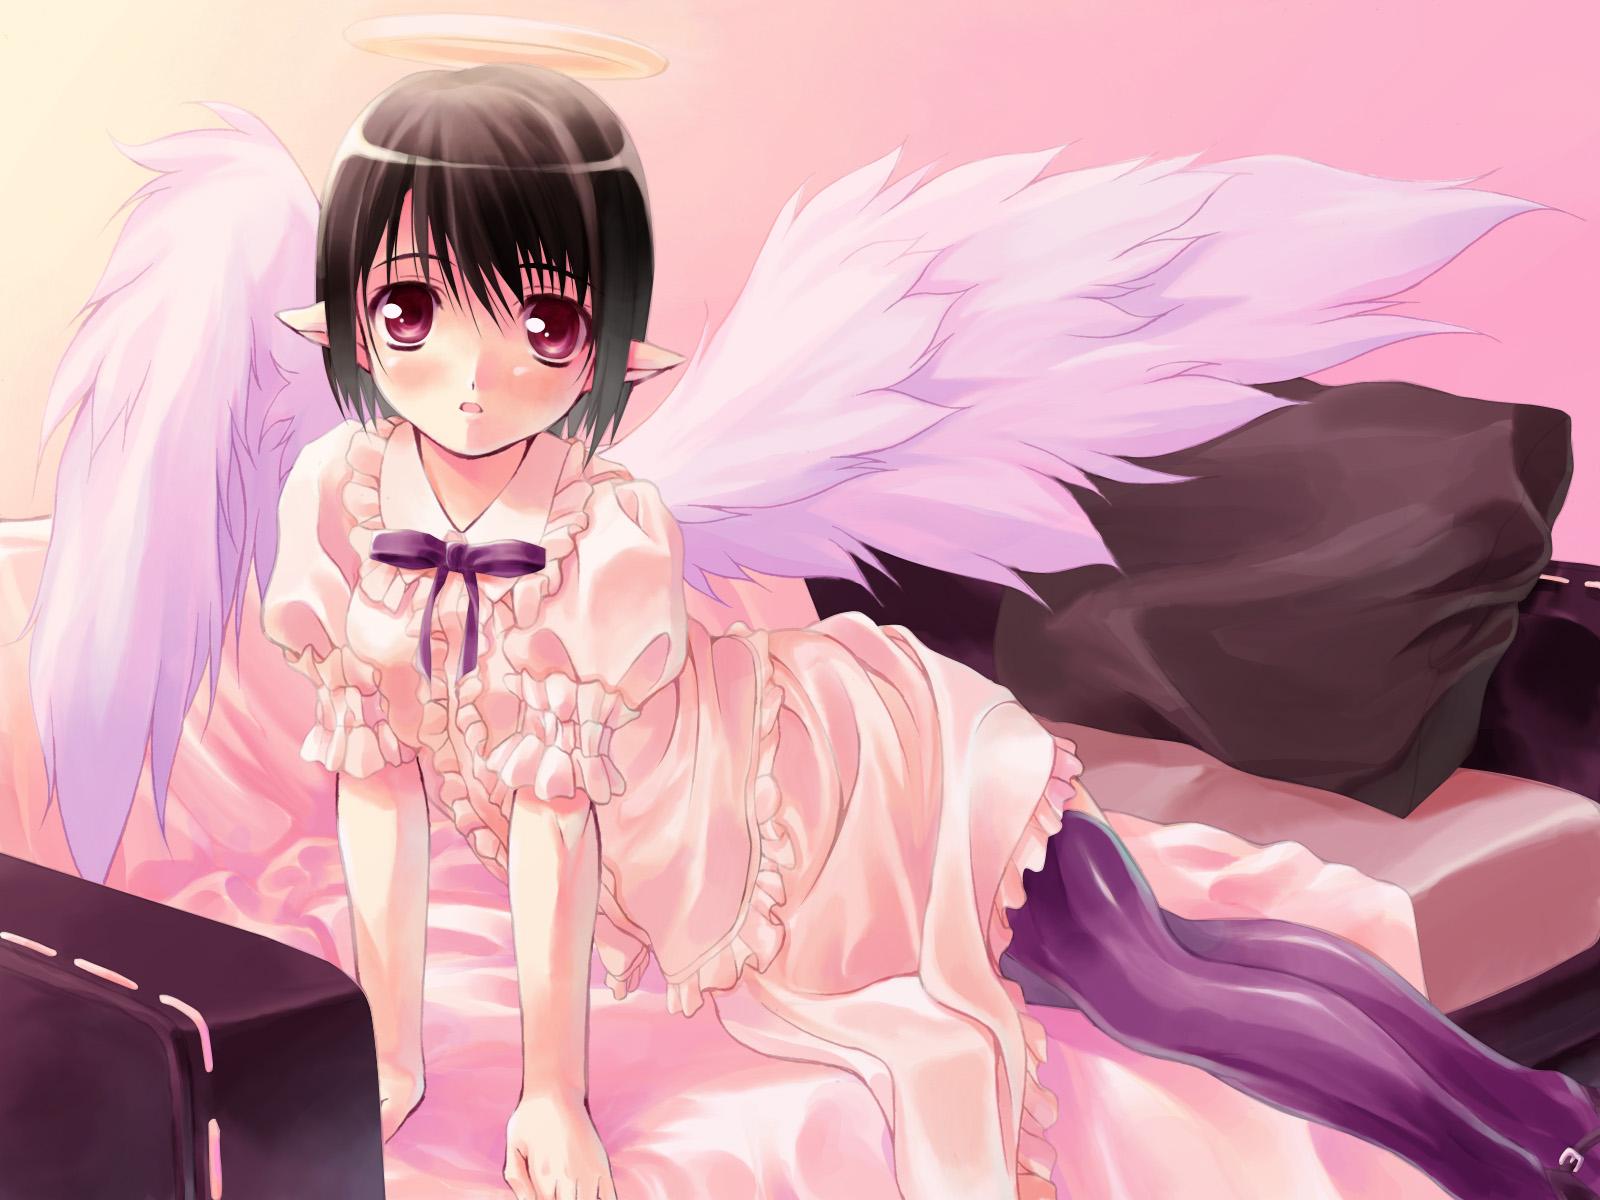 angel bed black_hair halo pointed_ears purple_eyes ribbons tagme_(artist) thighhighs wings